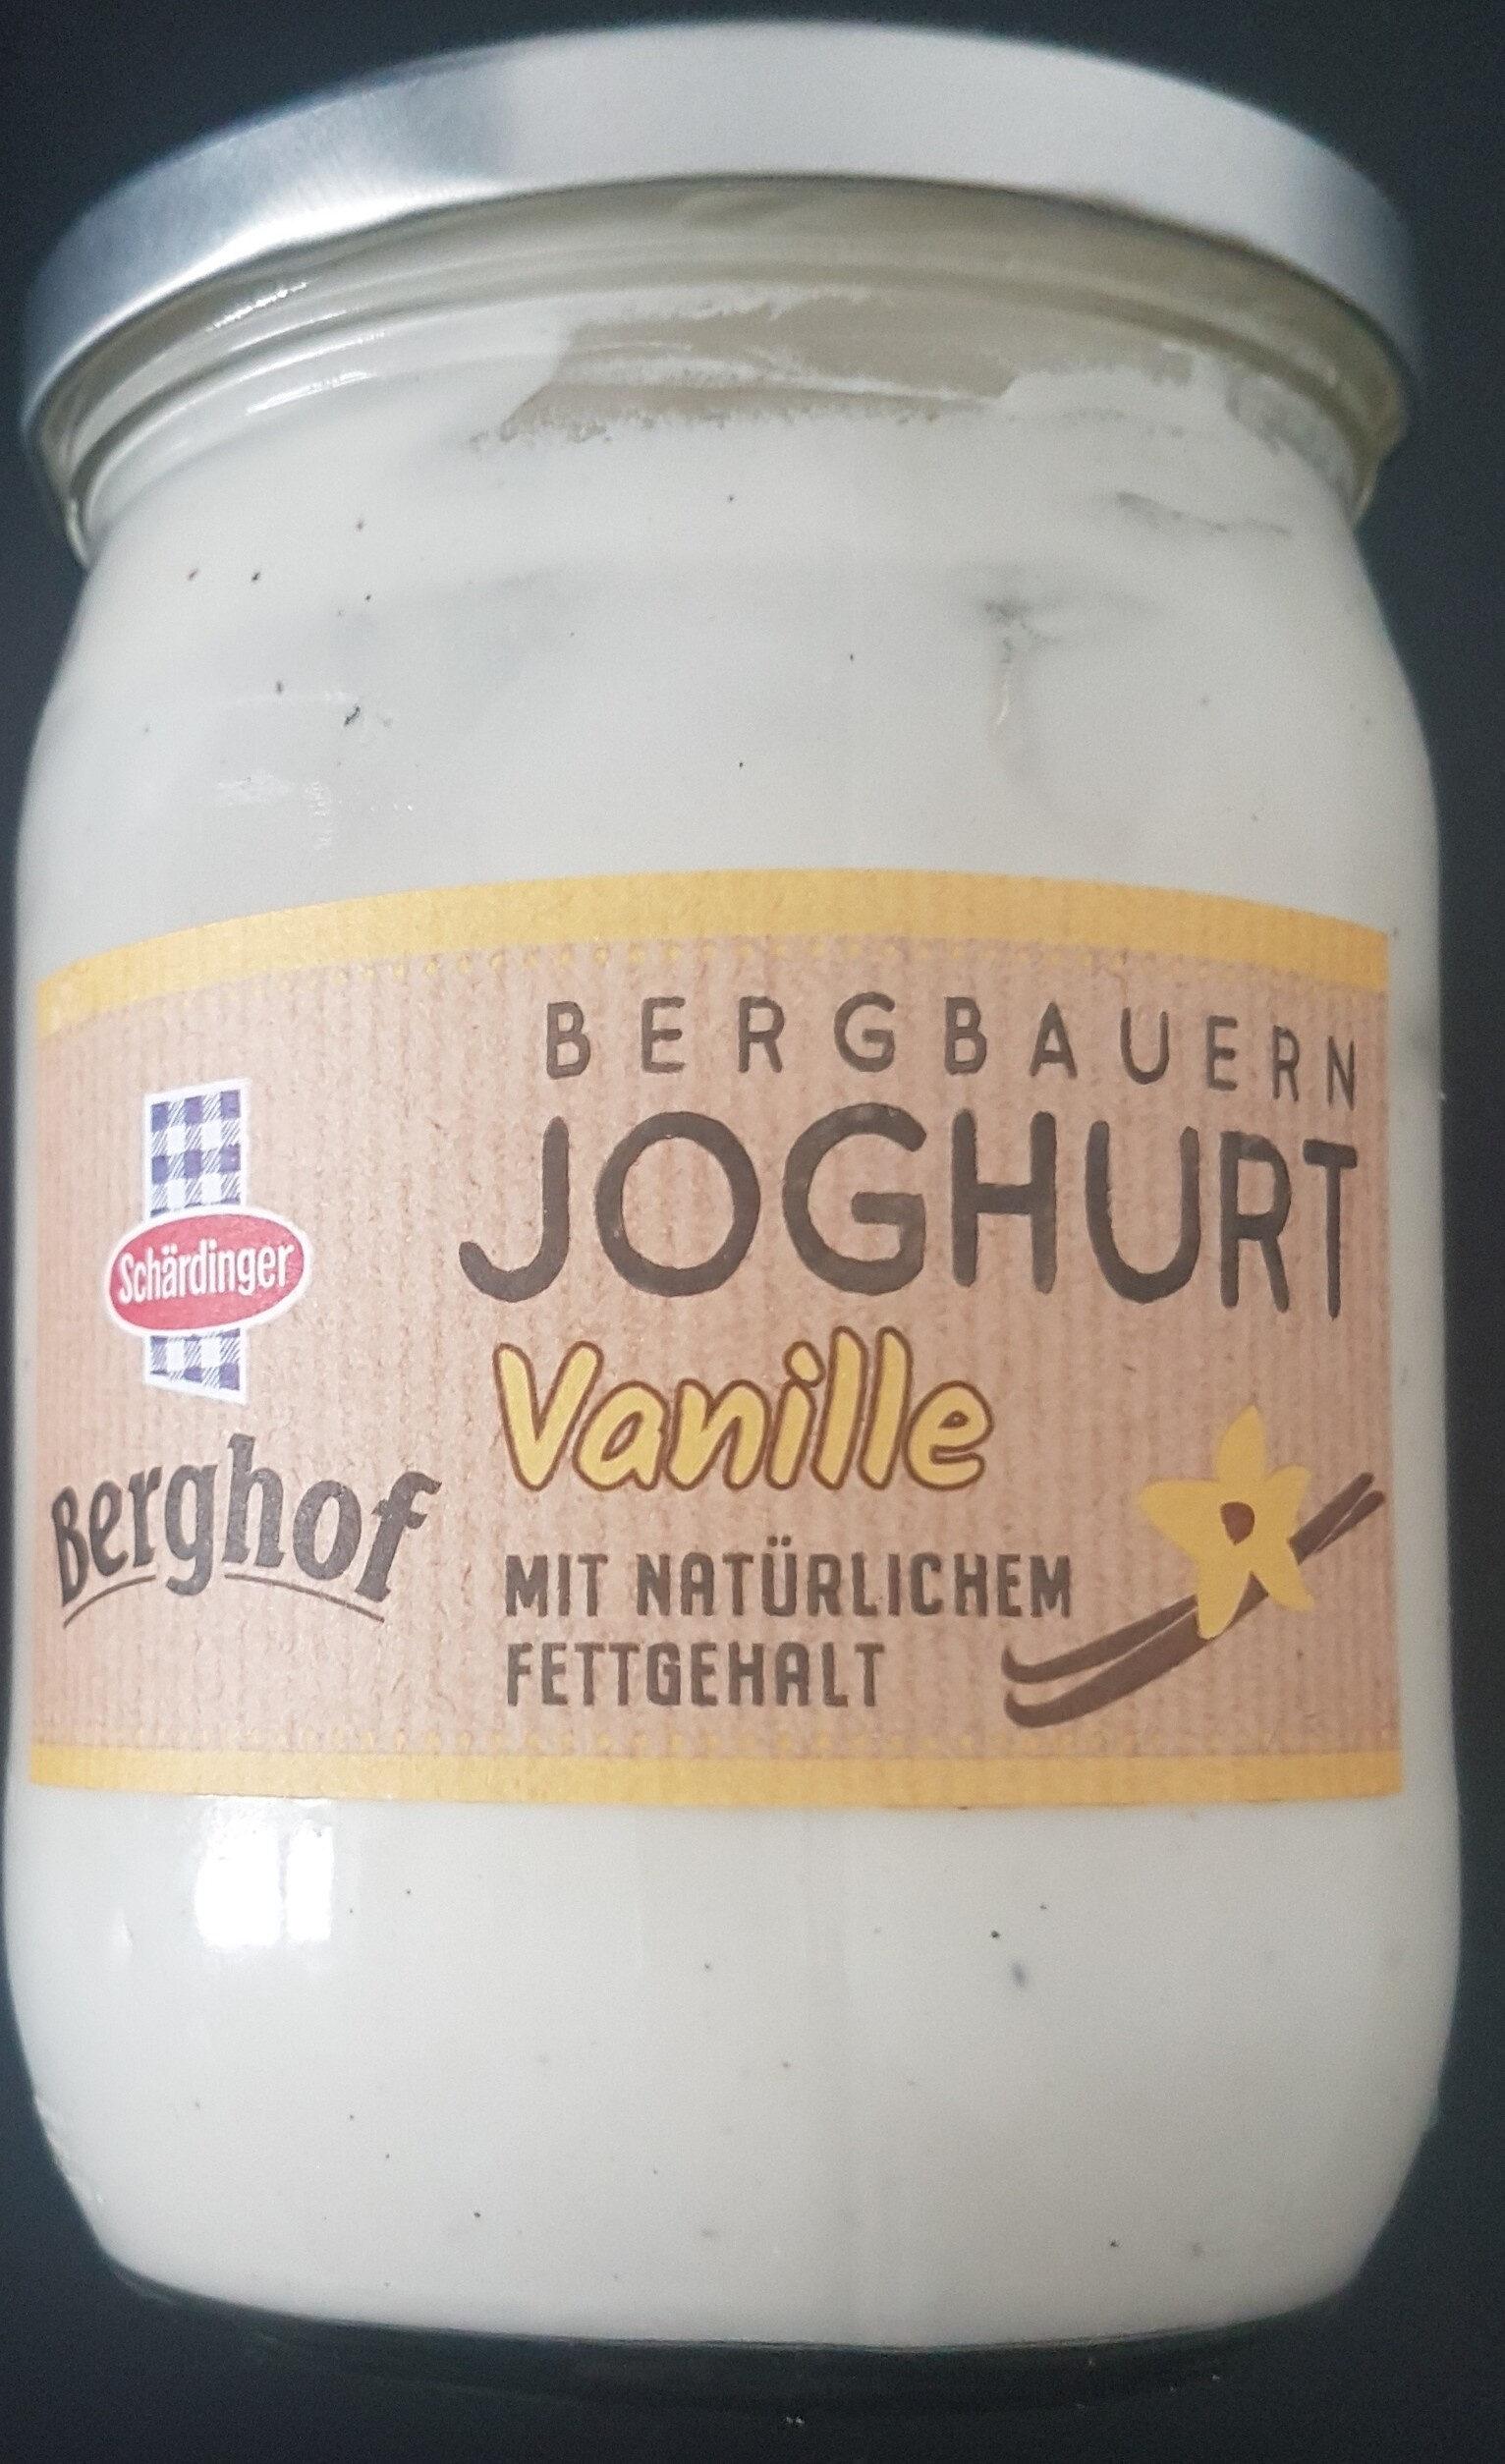 Bergbauern Joghurt Vanille - Product - de